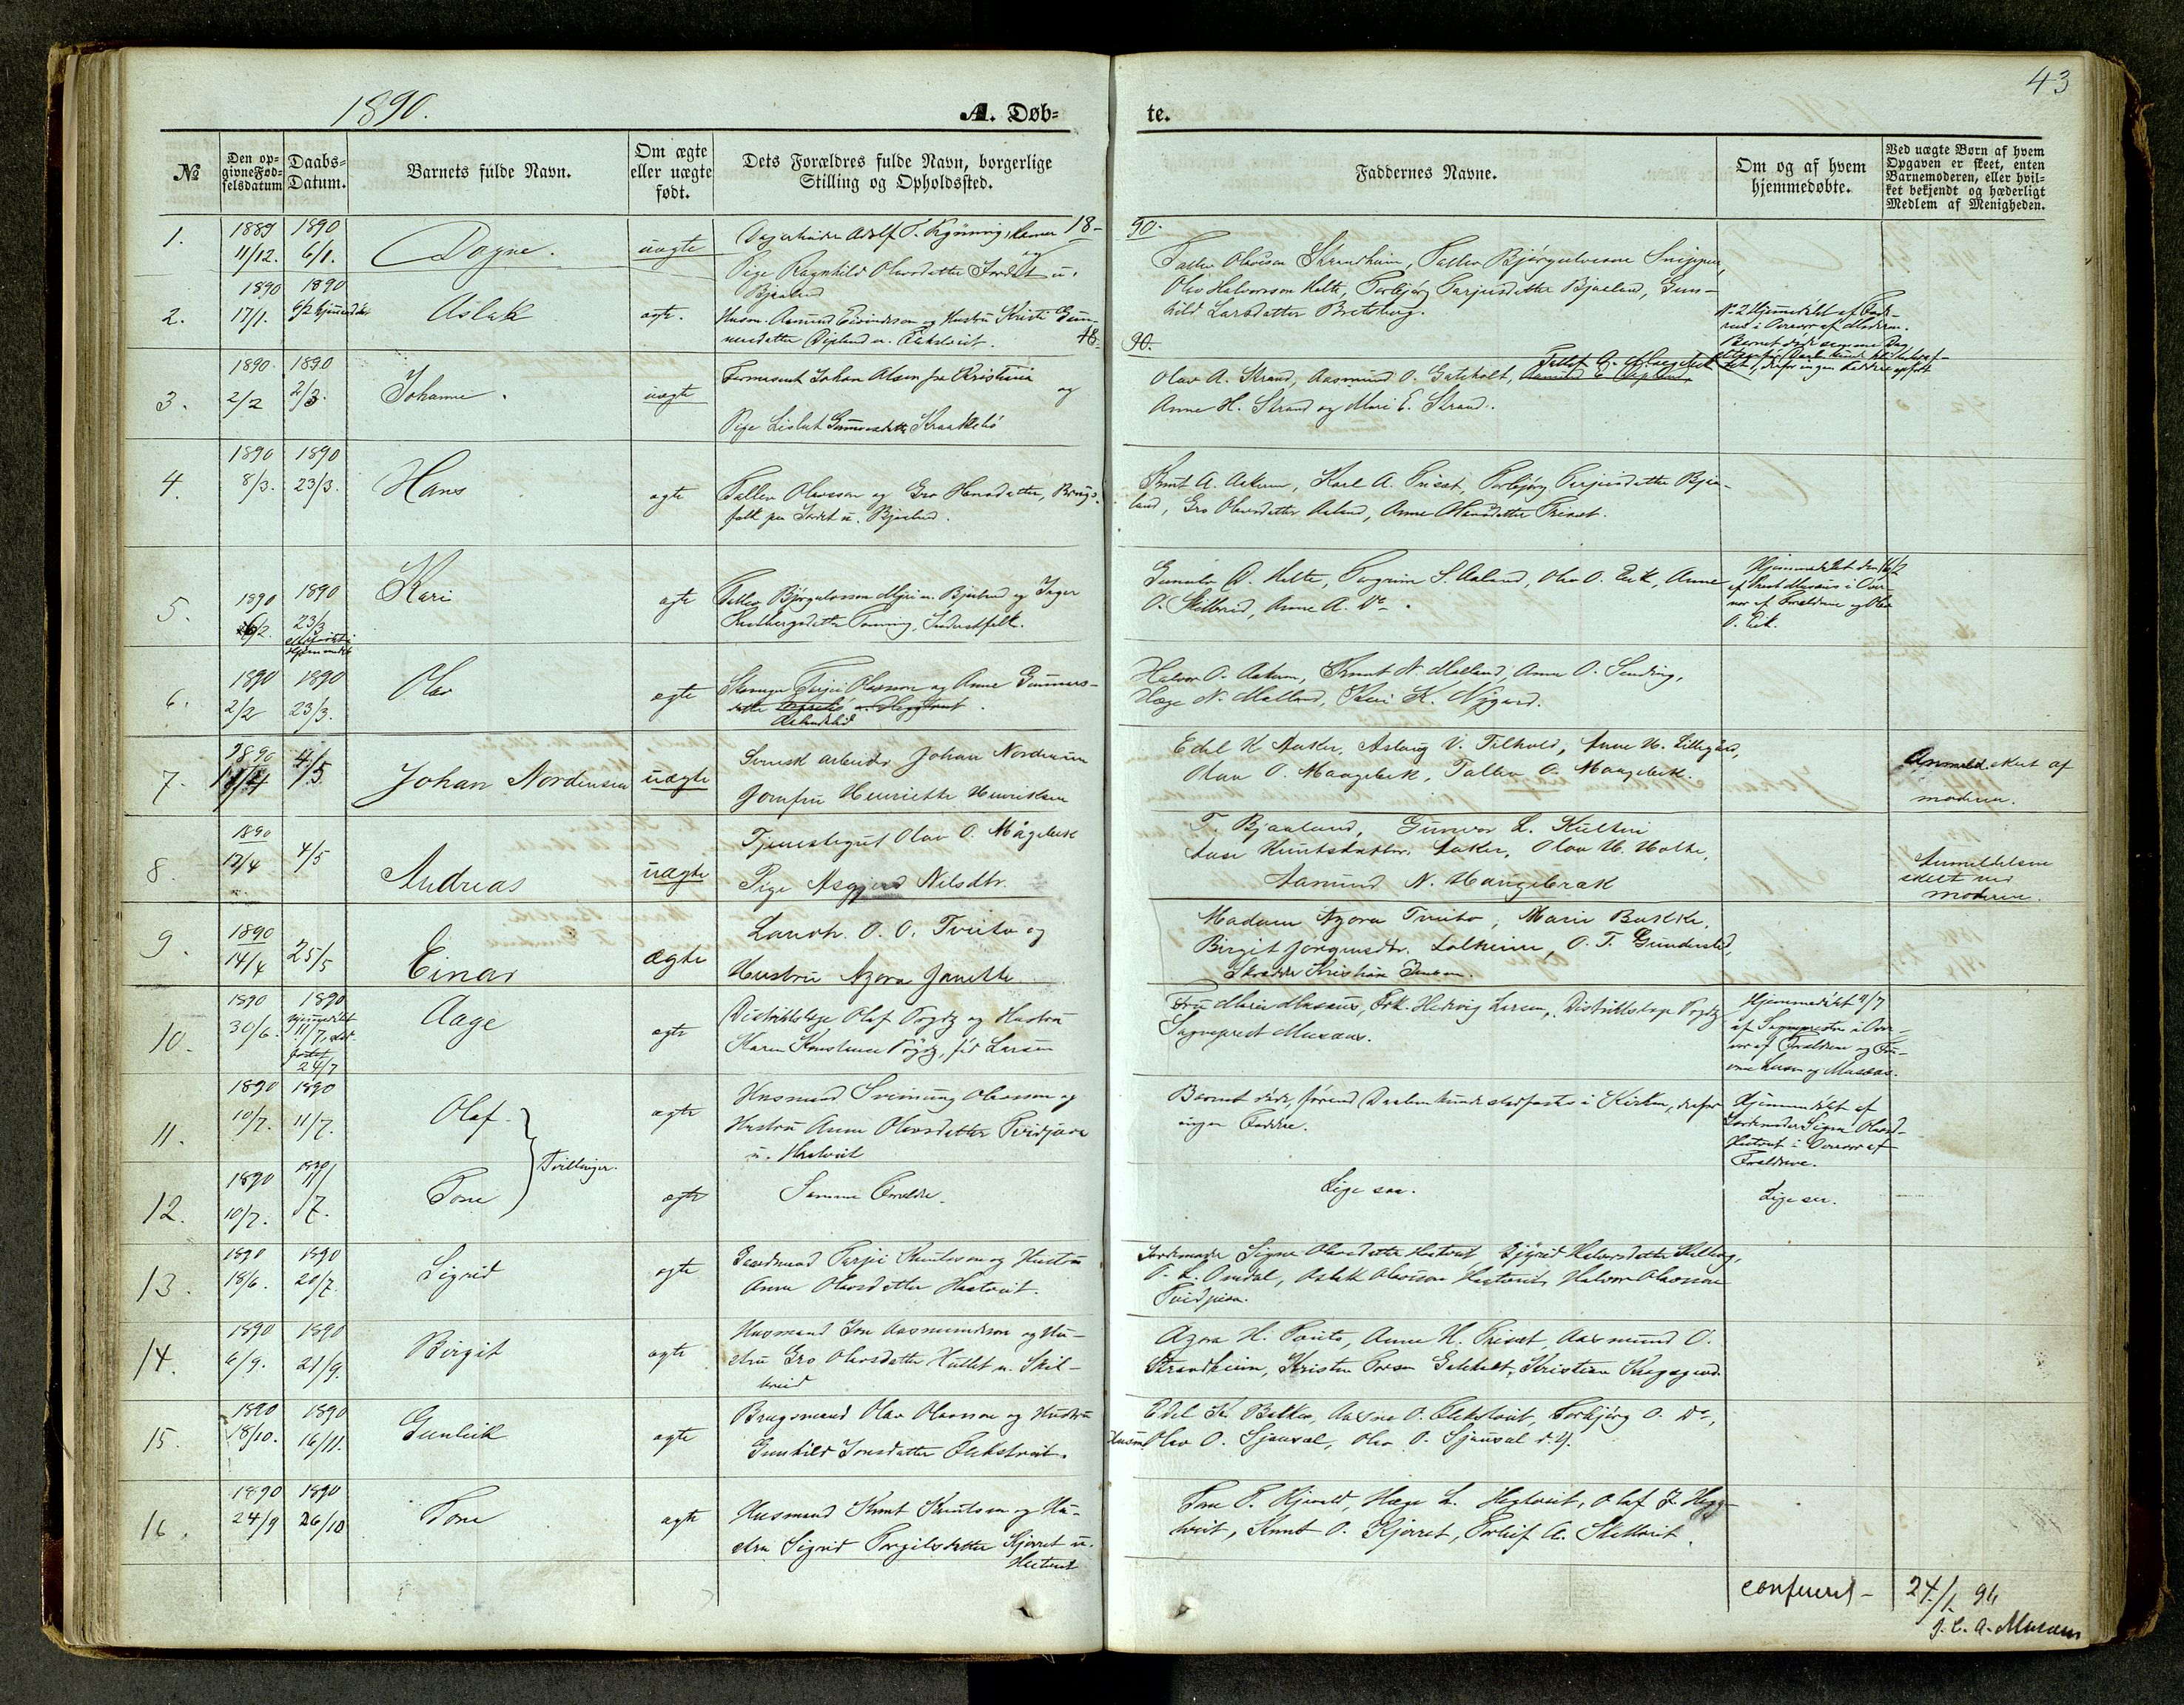 SAKO, Lårdal kirkebøker, G/Ga/L0002: Klokkerbok nr. I 2, 1861-1890, s. 43